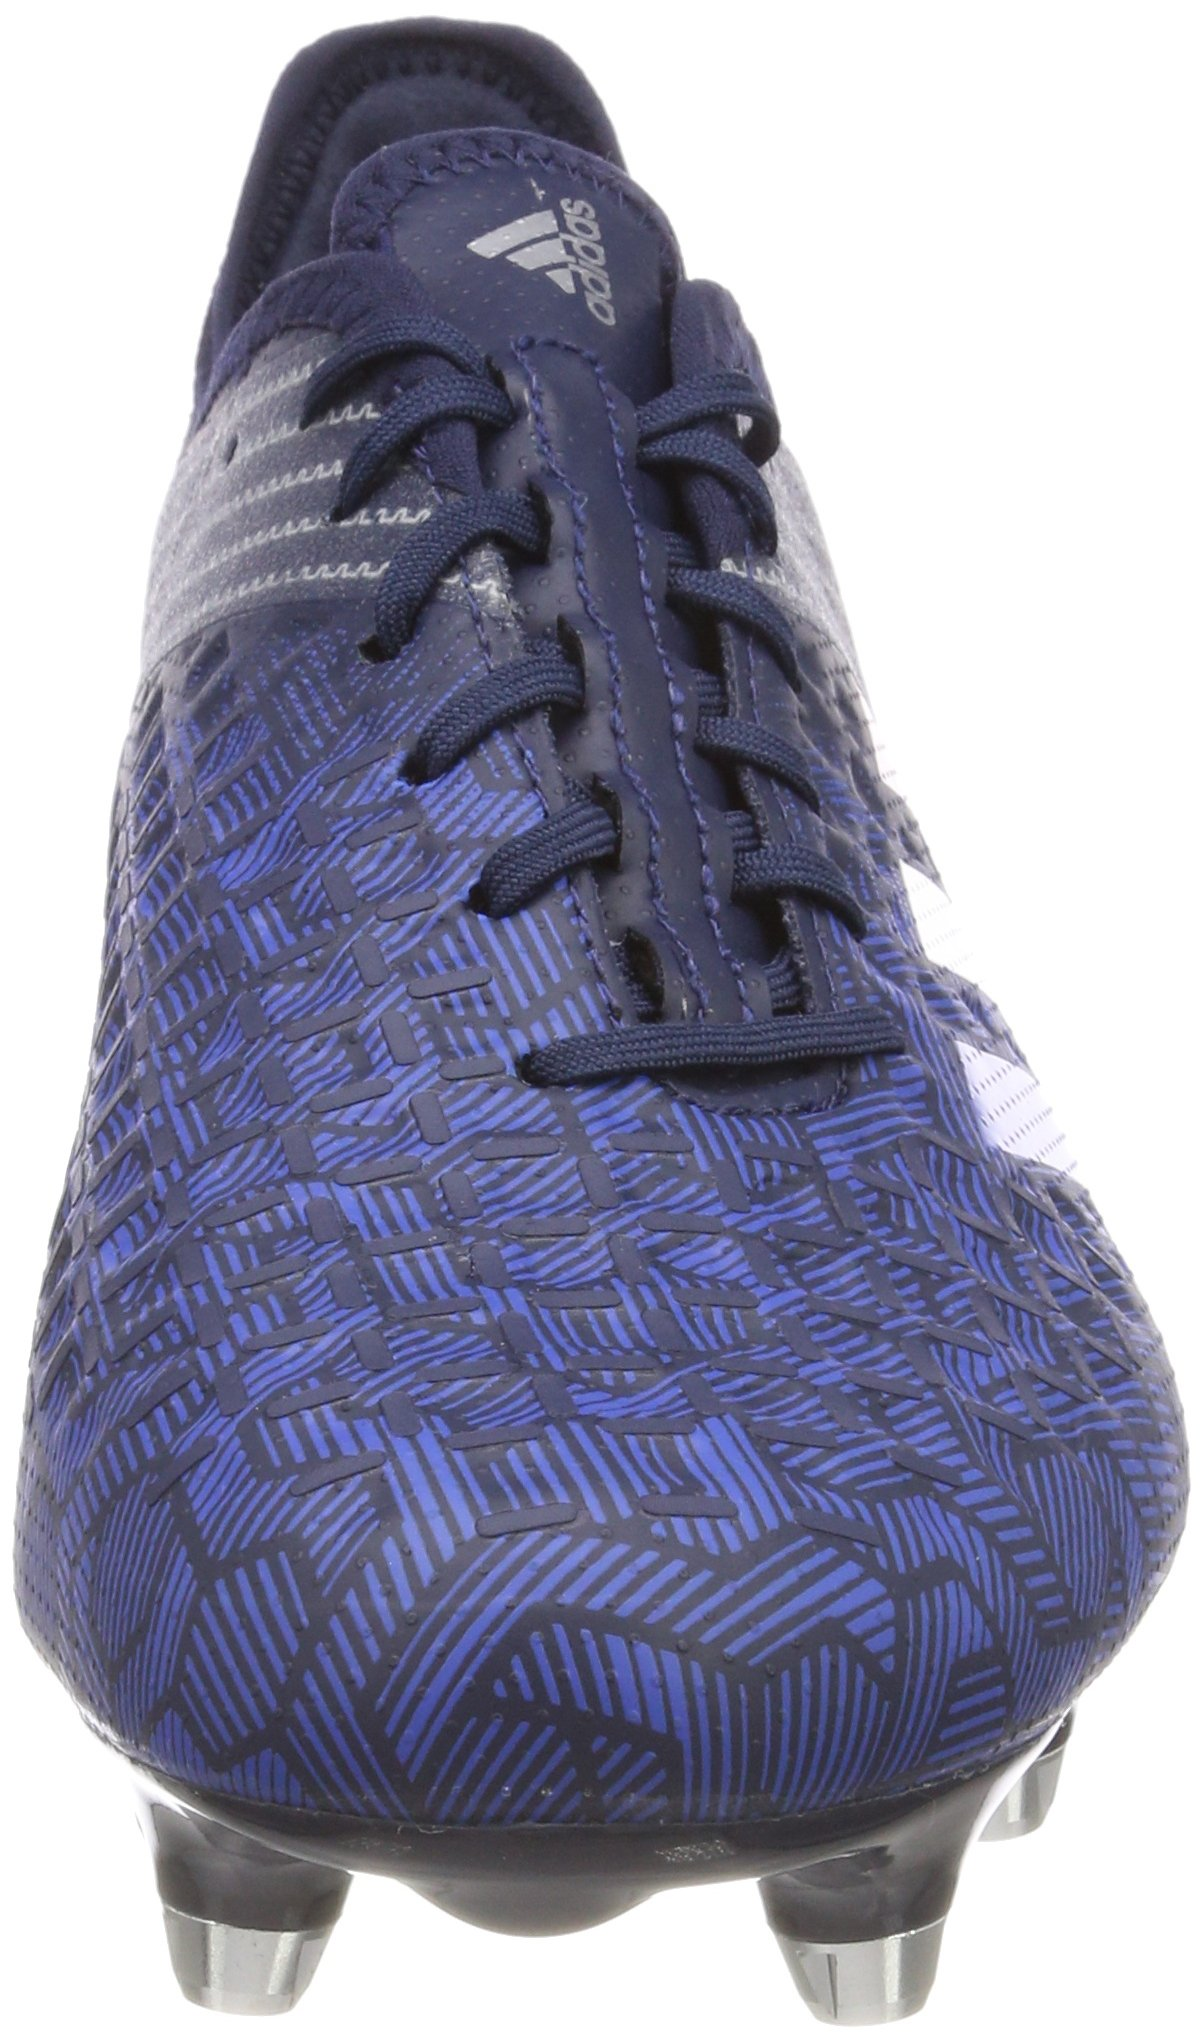 adidas Predator Malice Control (SG), Scarpe da Football Americano Uomo 4 spesavip